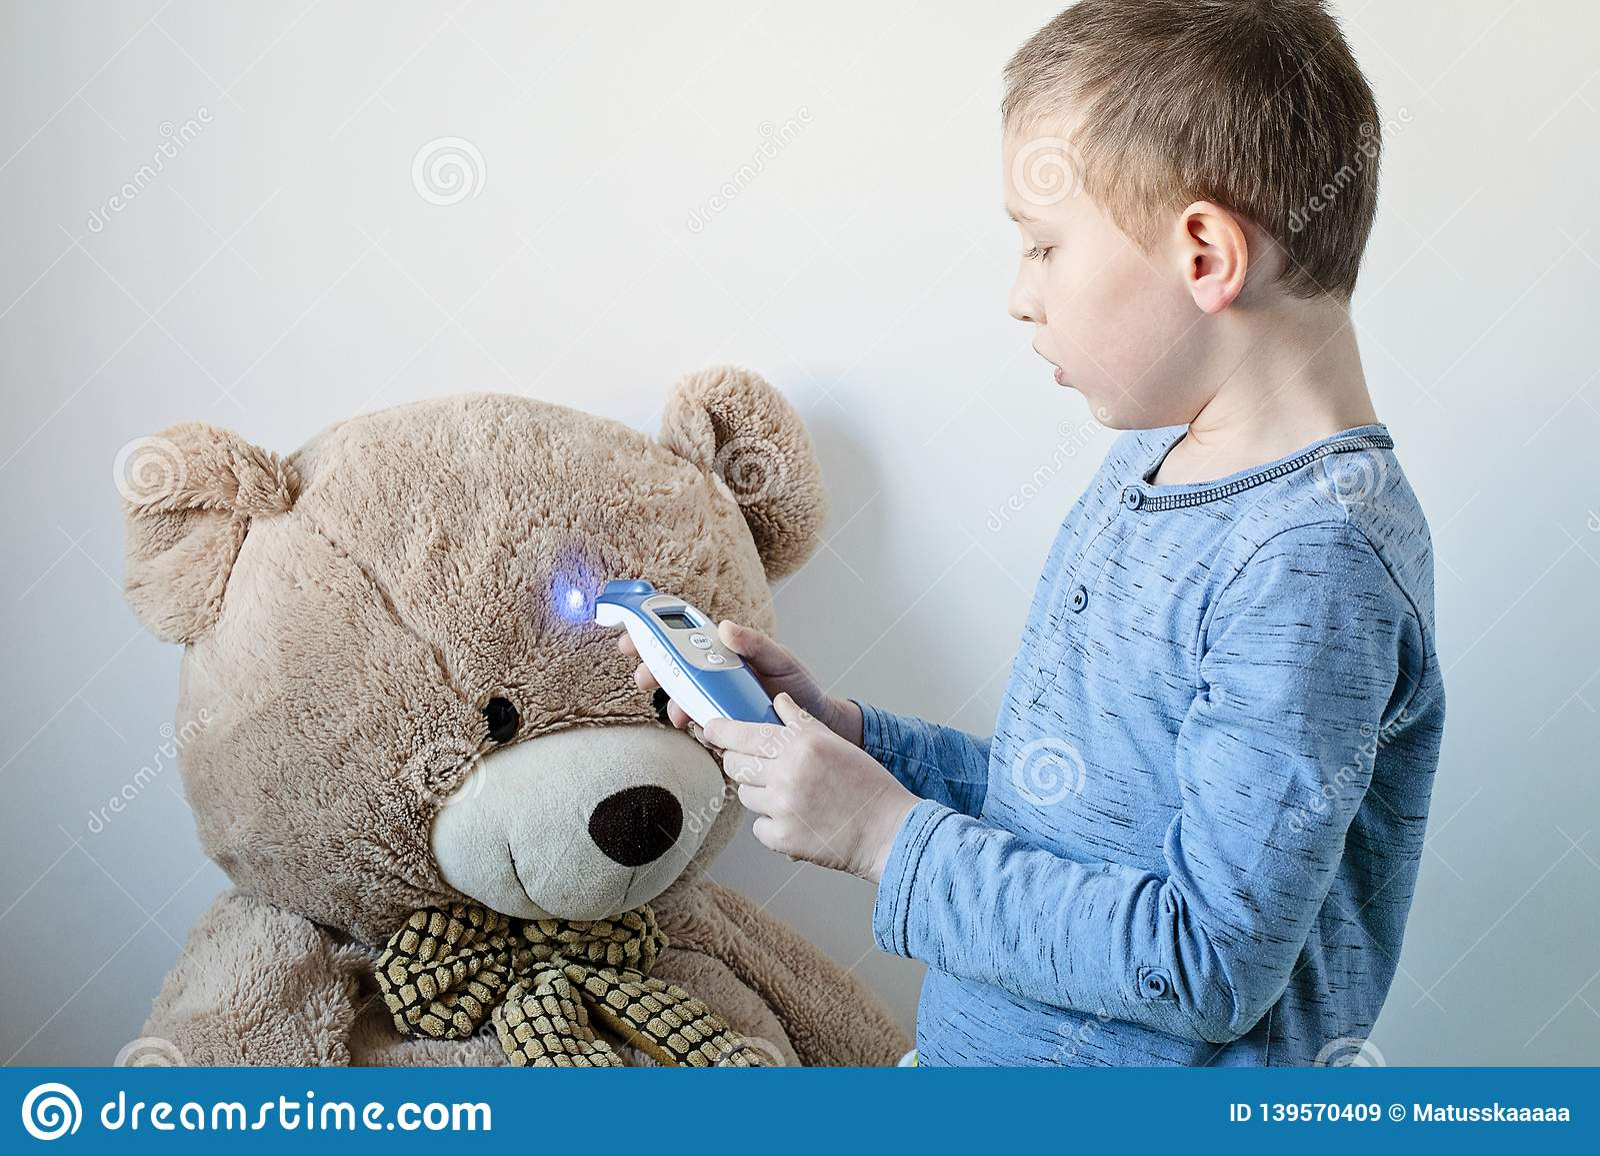 Pre School Boy Is Looking After His Sick Teddy Bear Boy